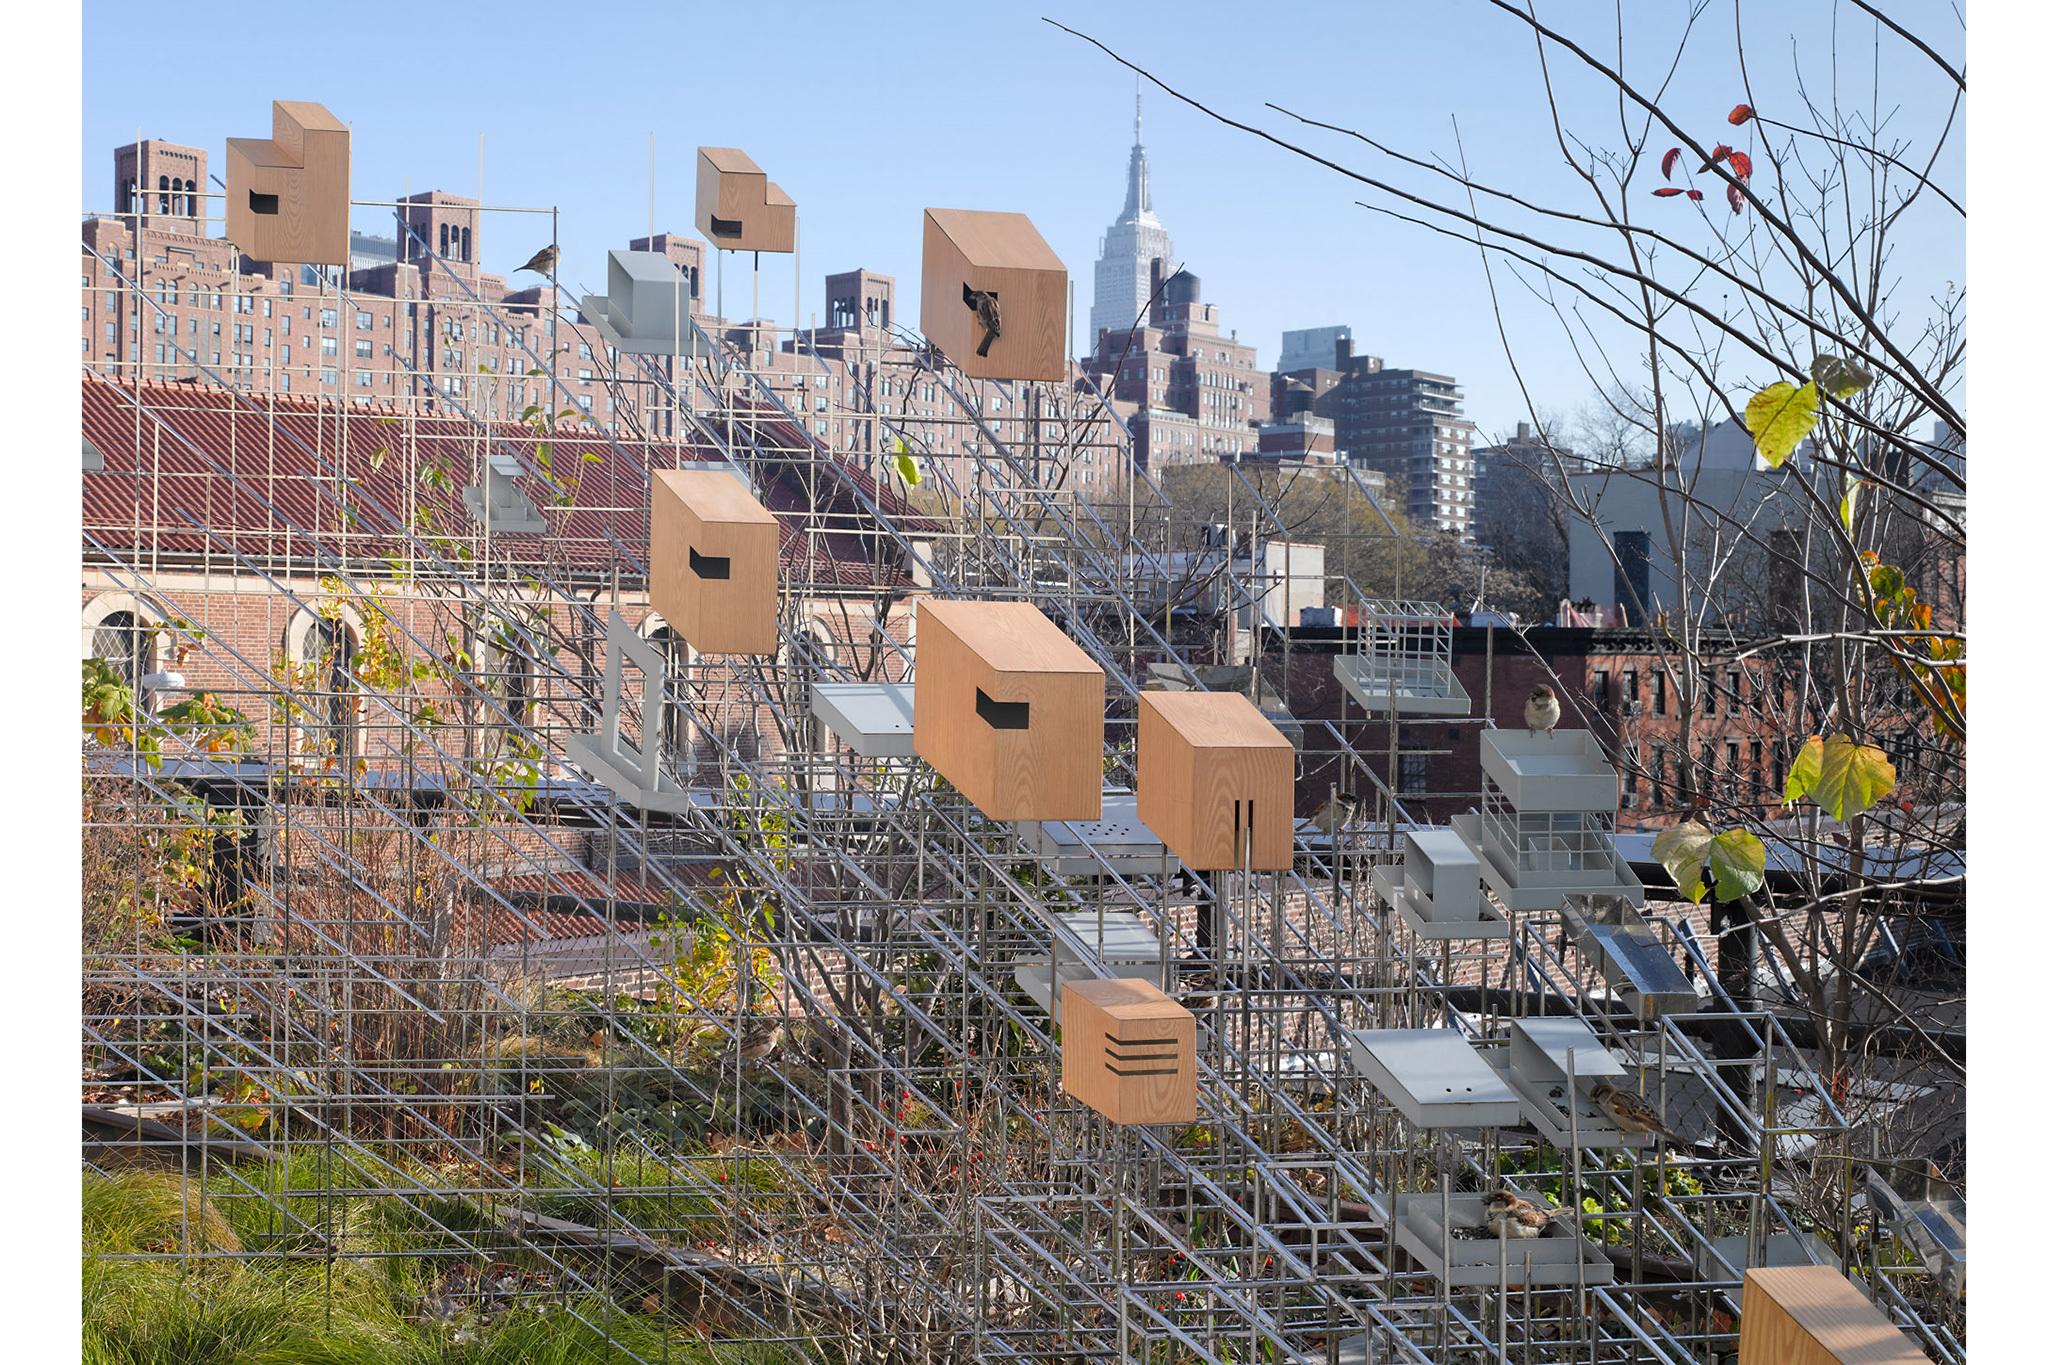 Public art on the High Line